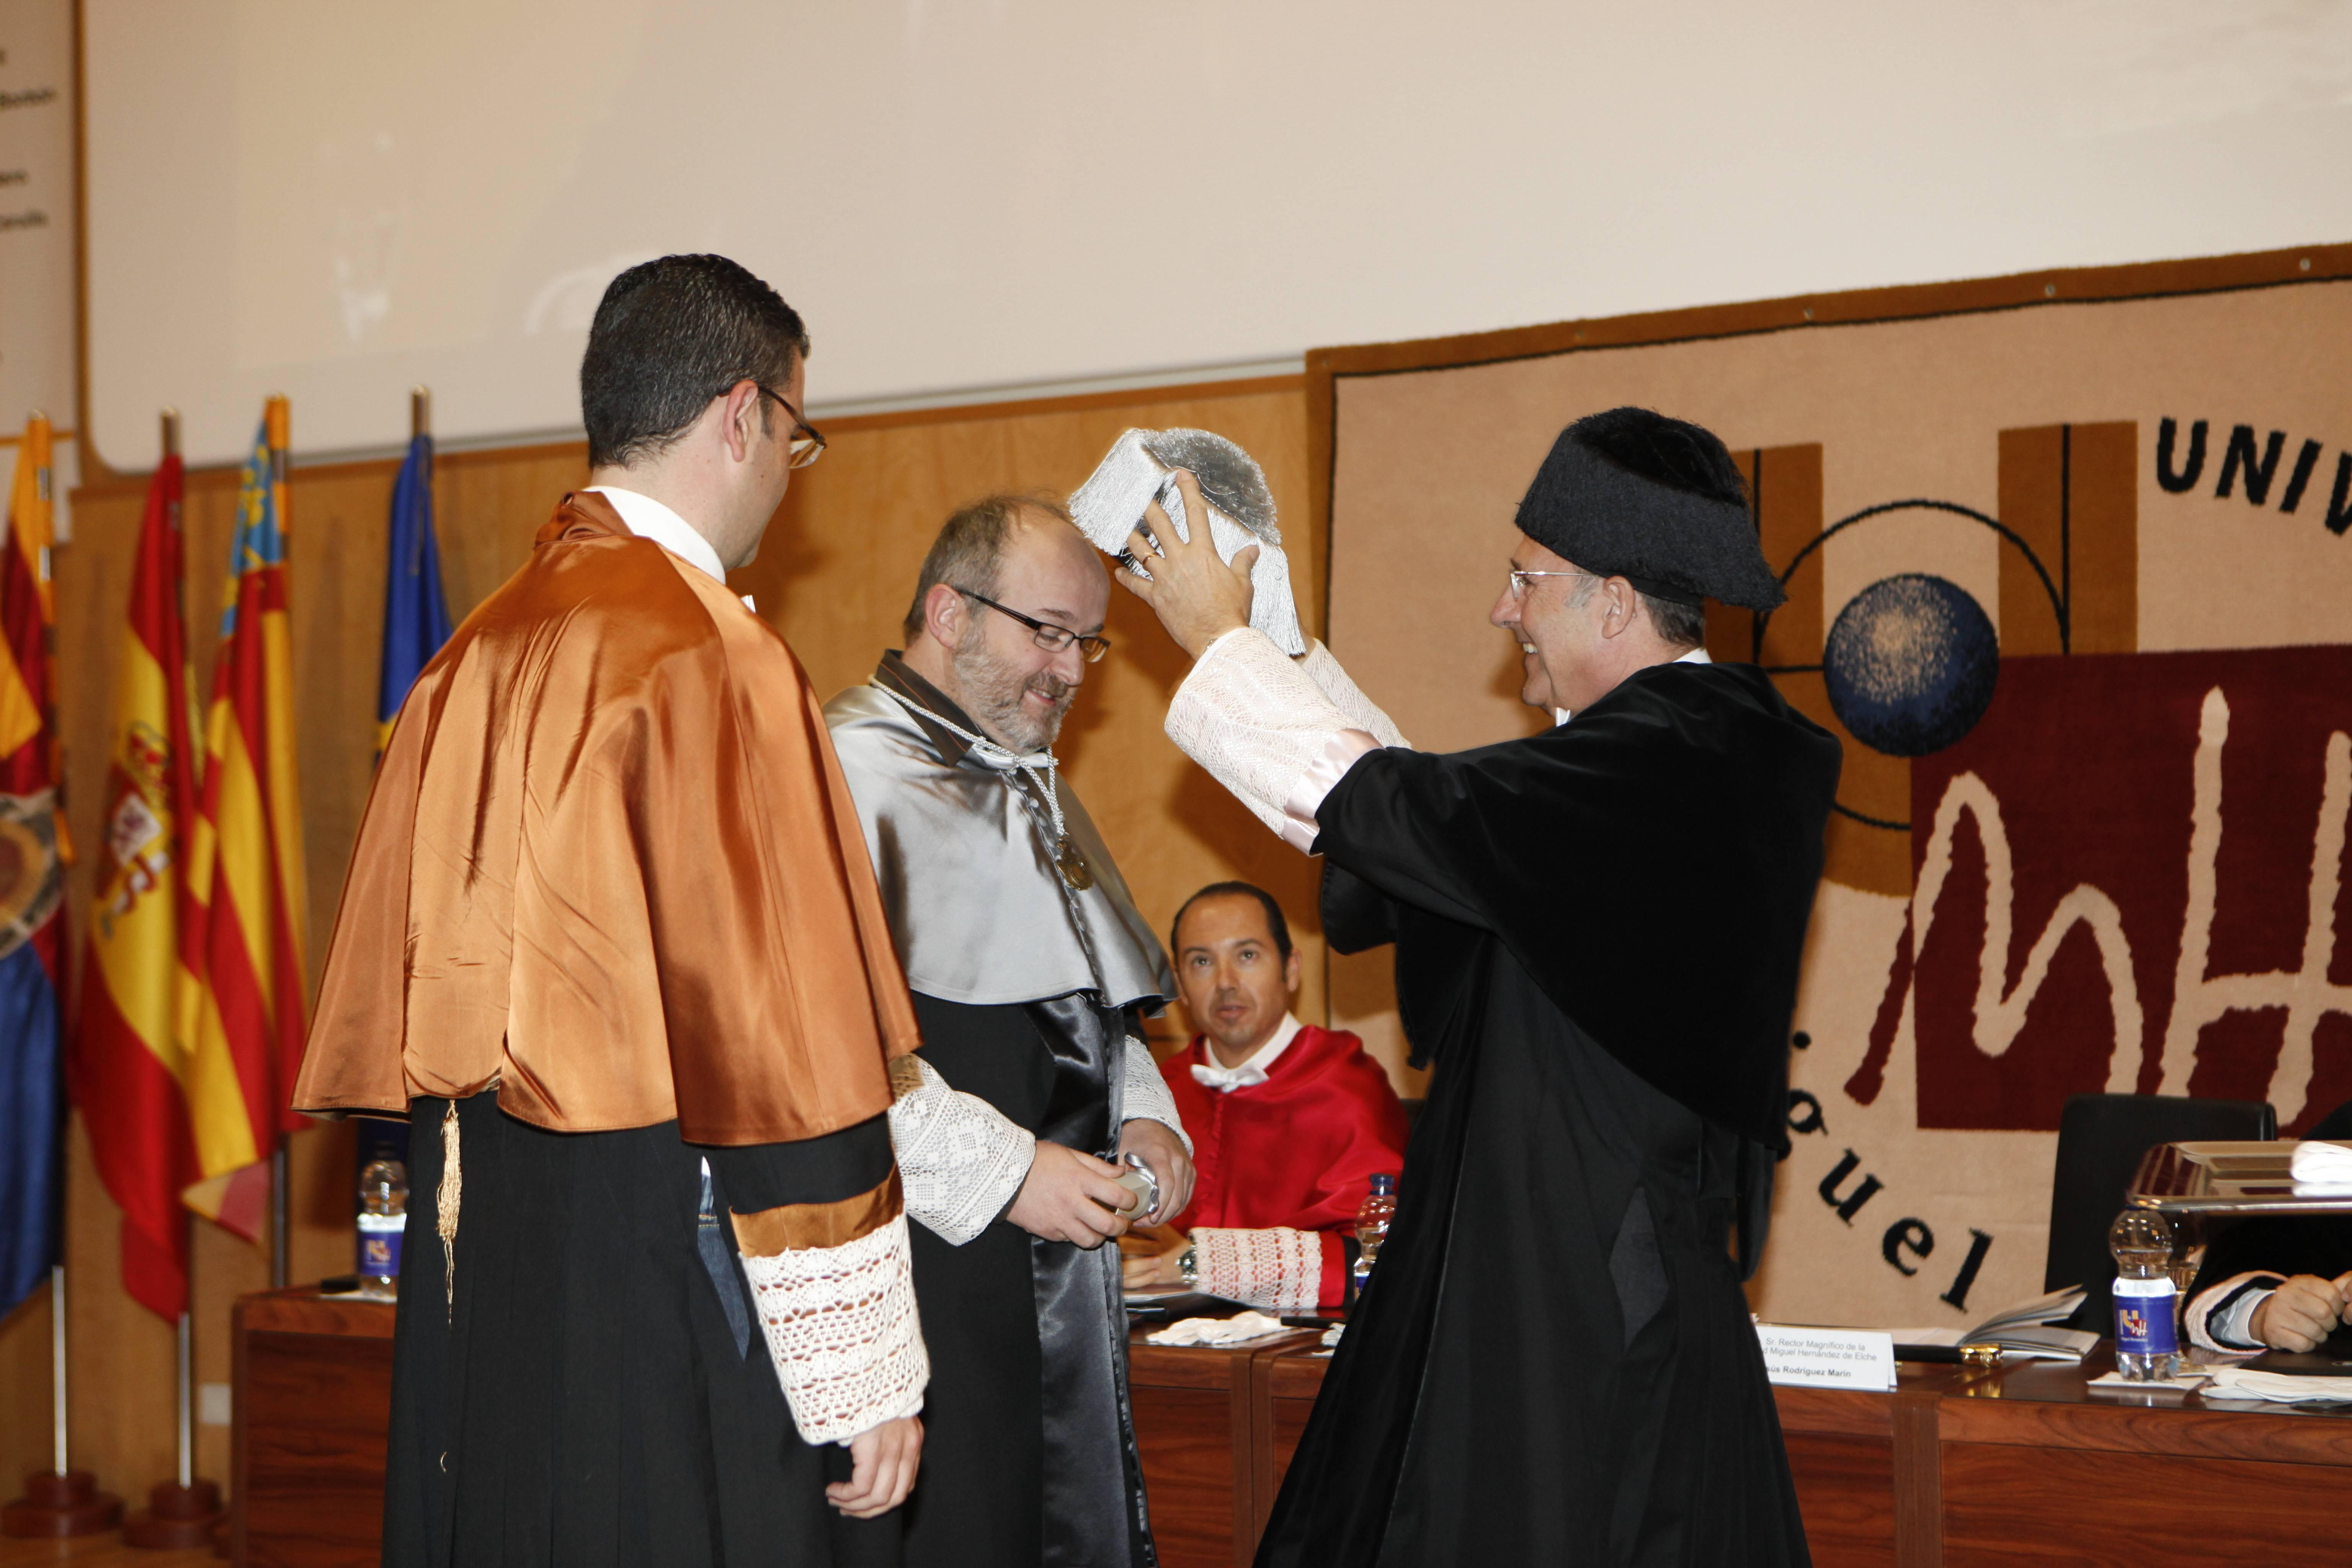 doctor-honoris-causa-luis-gamir_mg_1114.jpg